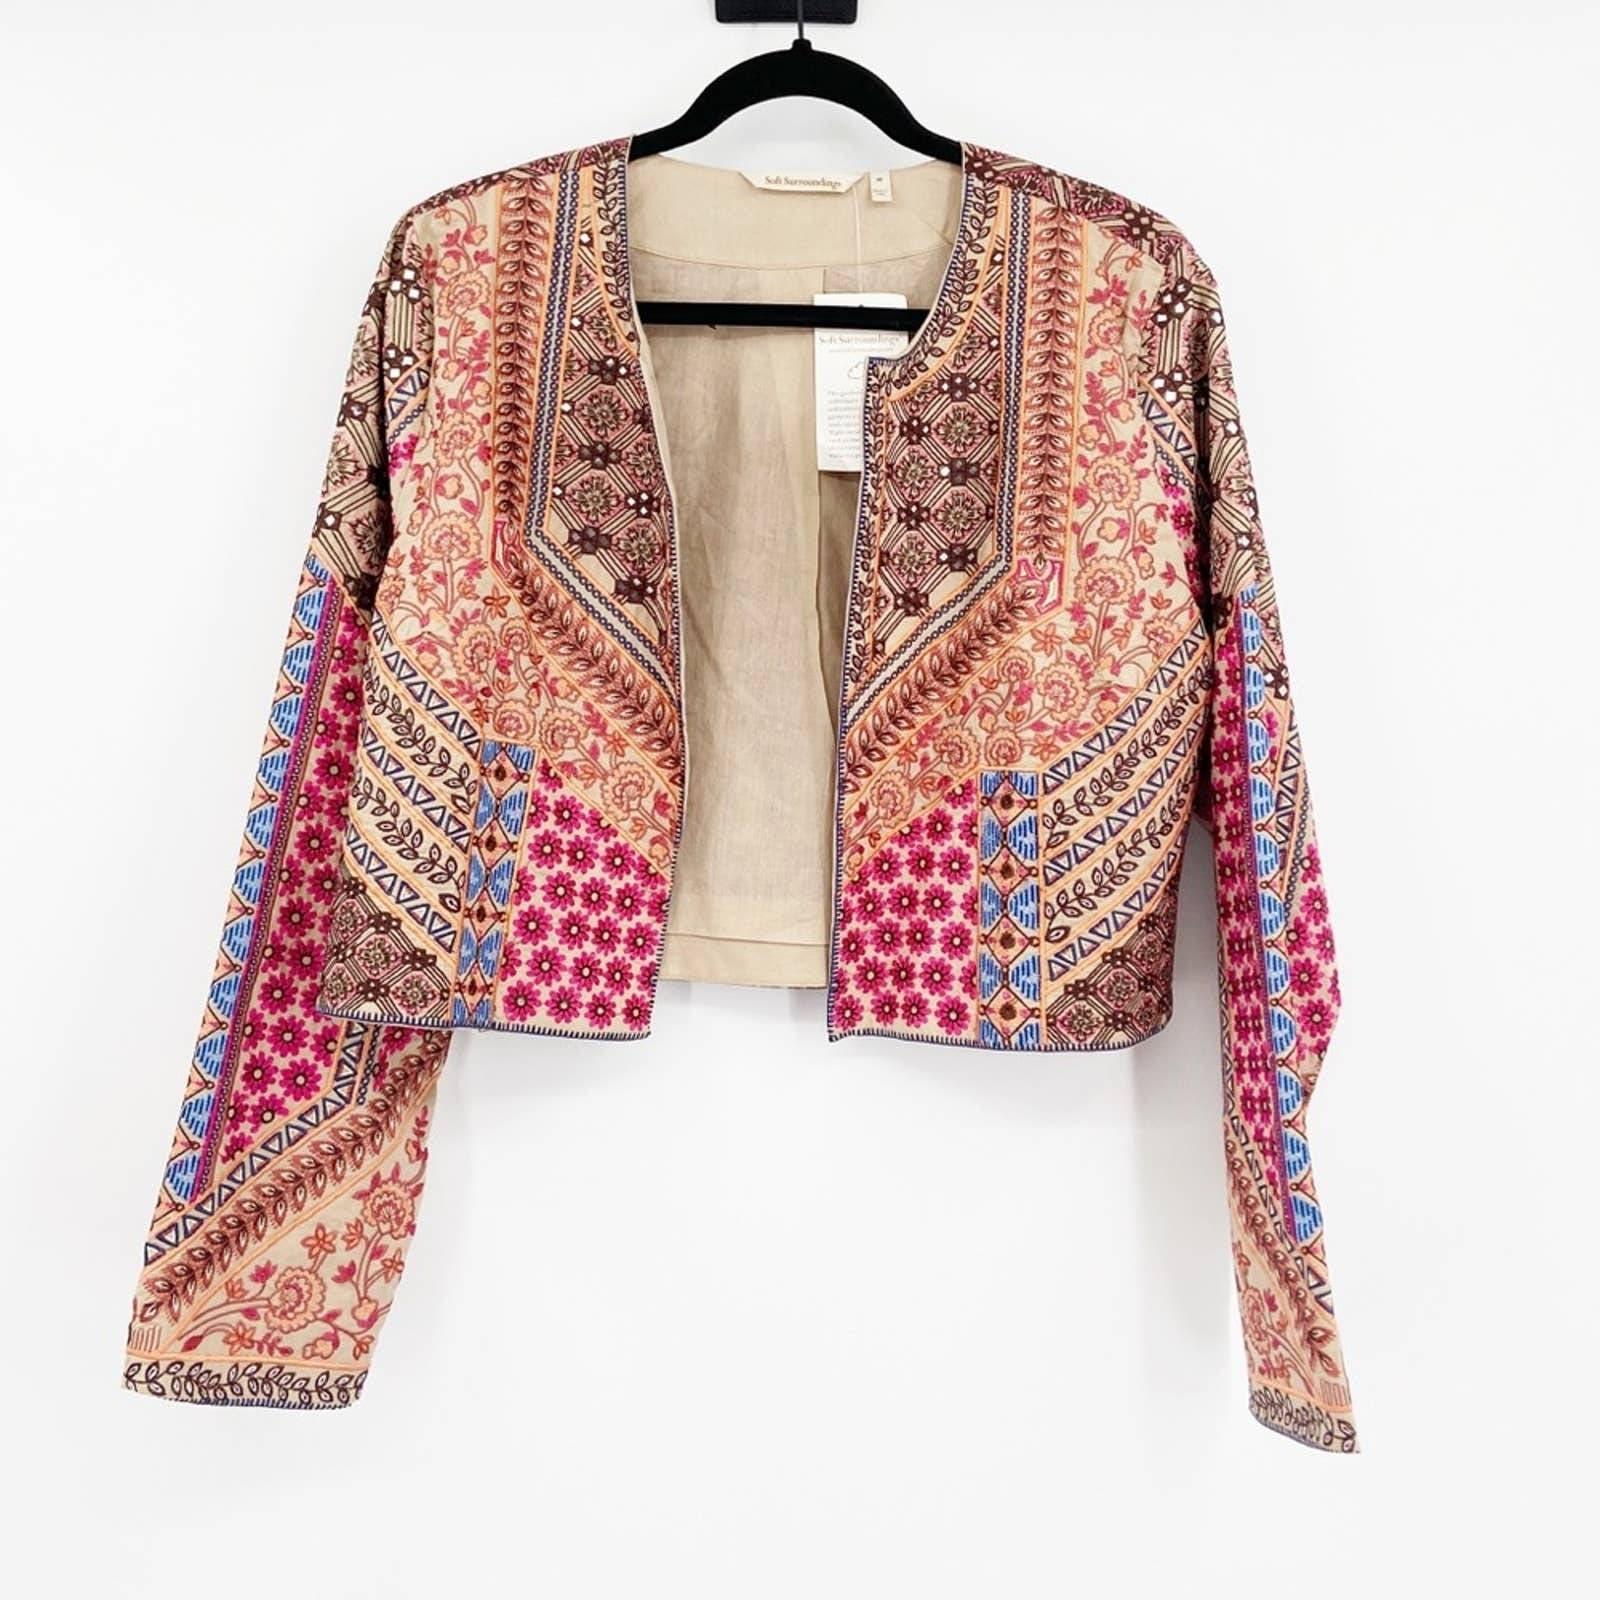 Soft Surroundings Livia Bolero Jacket